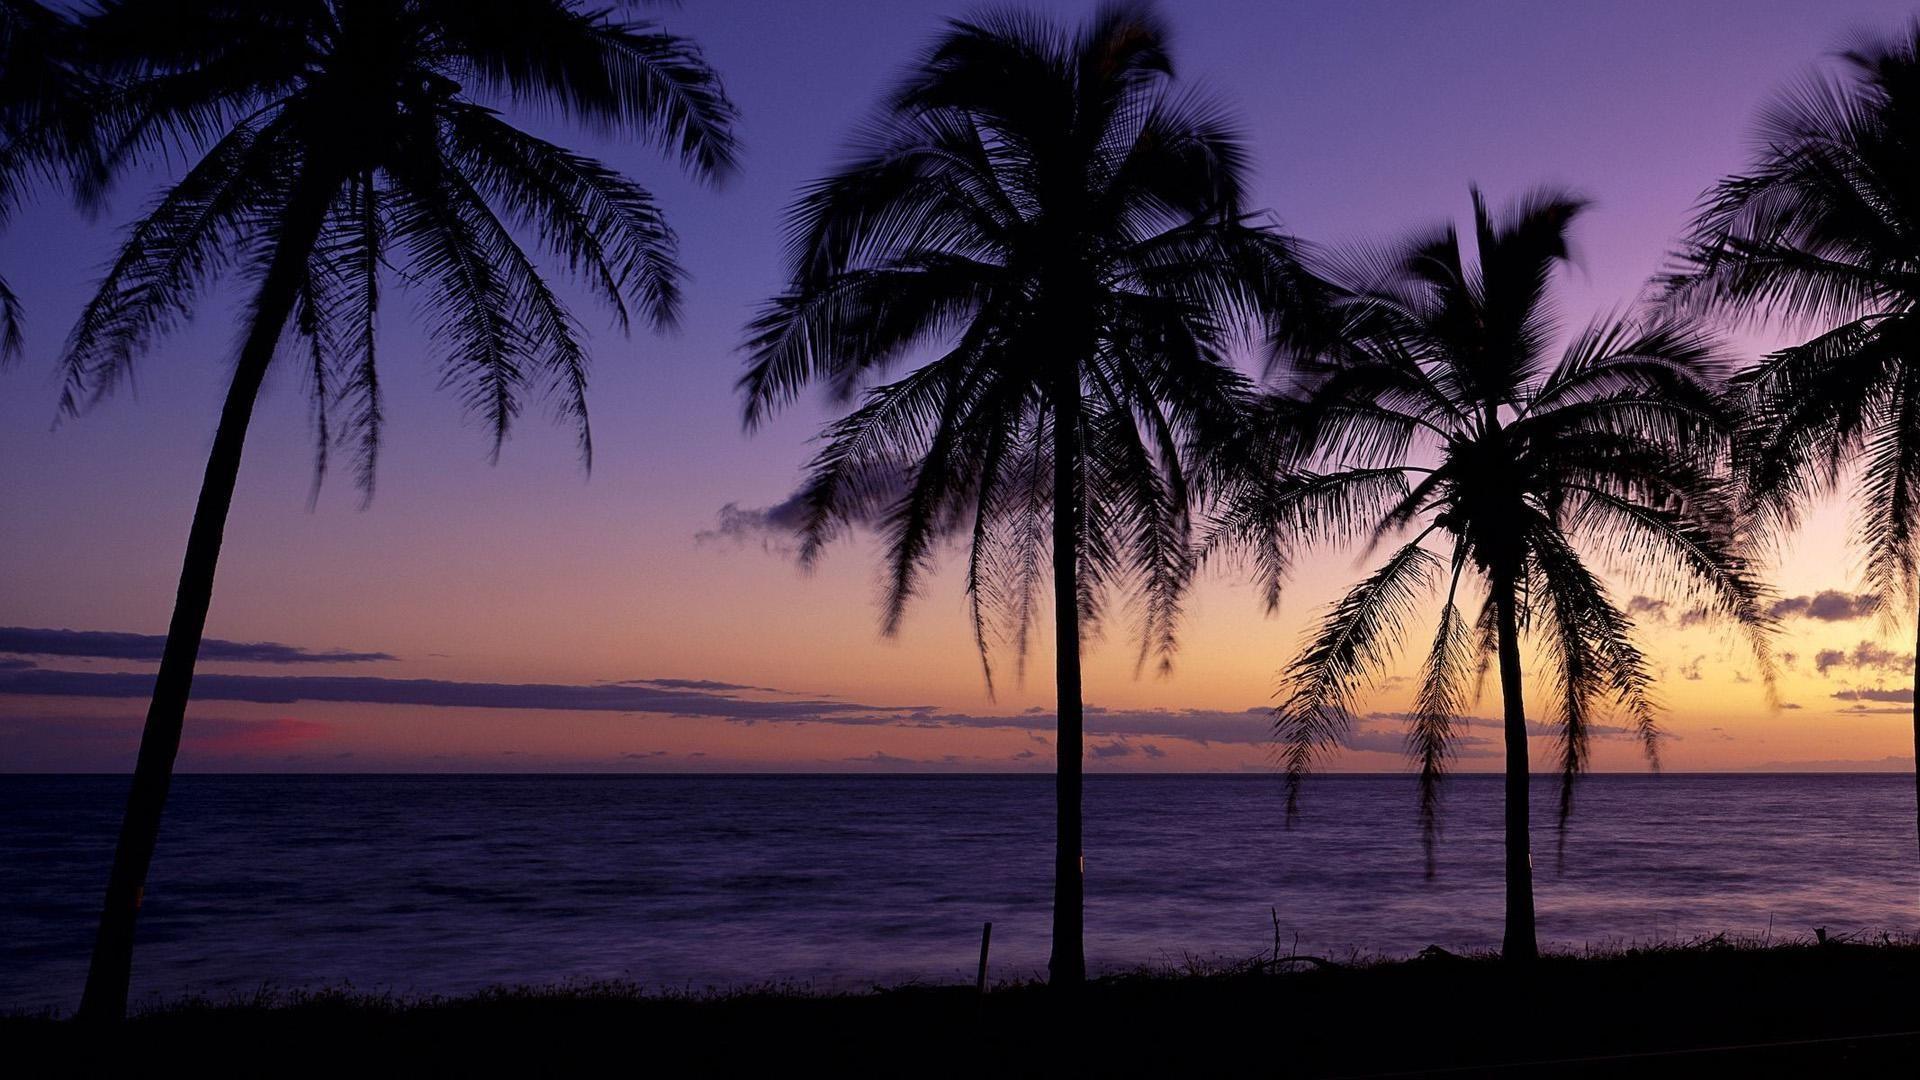 Windows Panoramic Beach Theme Wallpaper - Twitter Header Palm Trees - HD Wallpaper